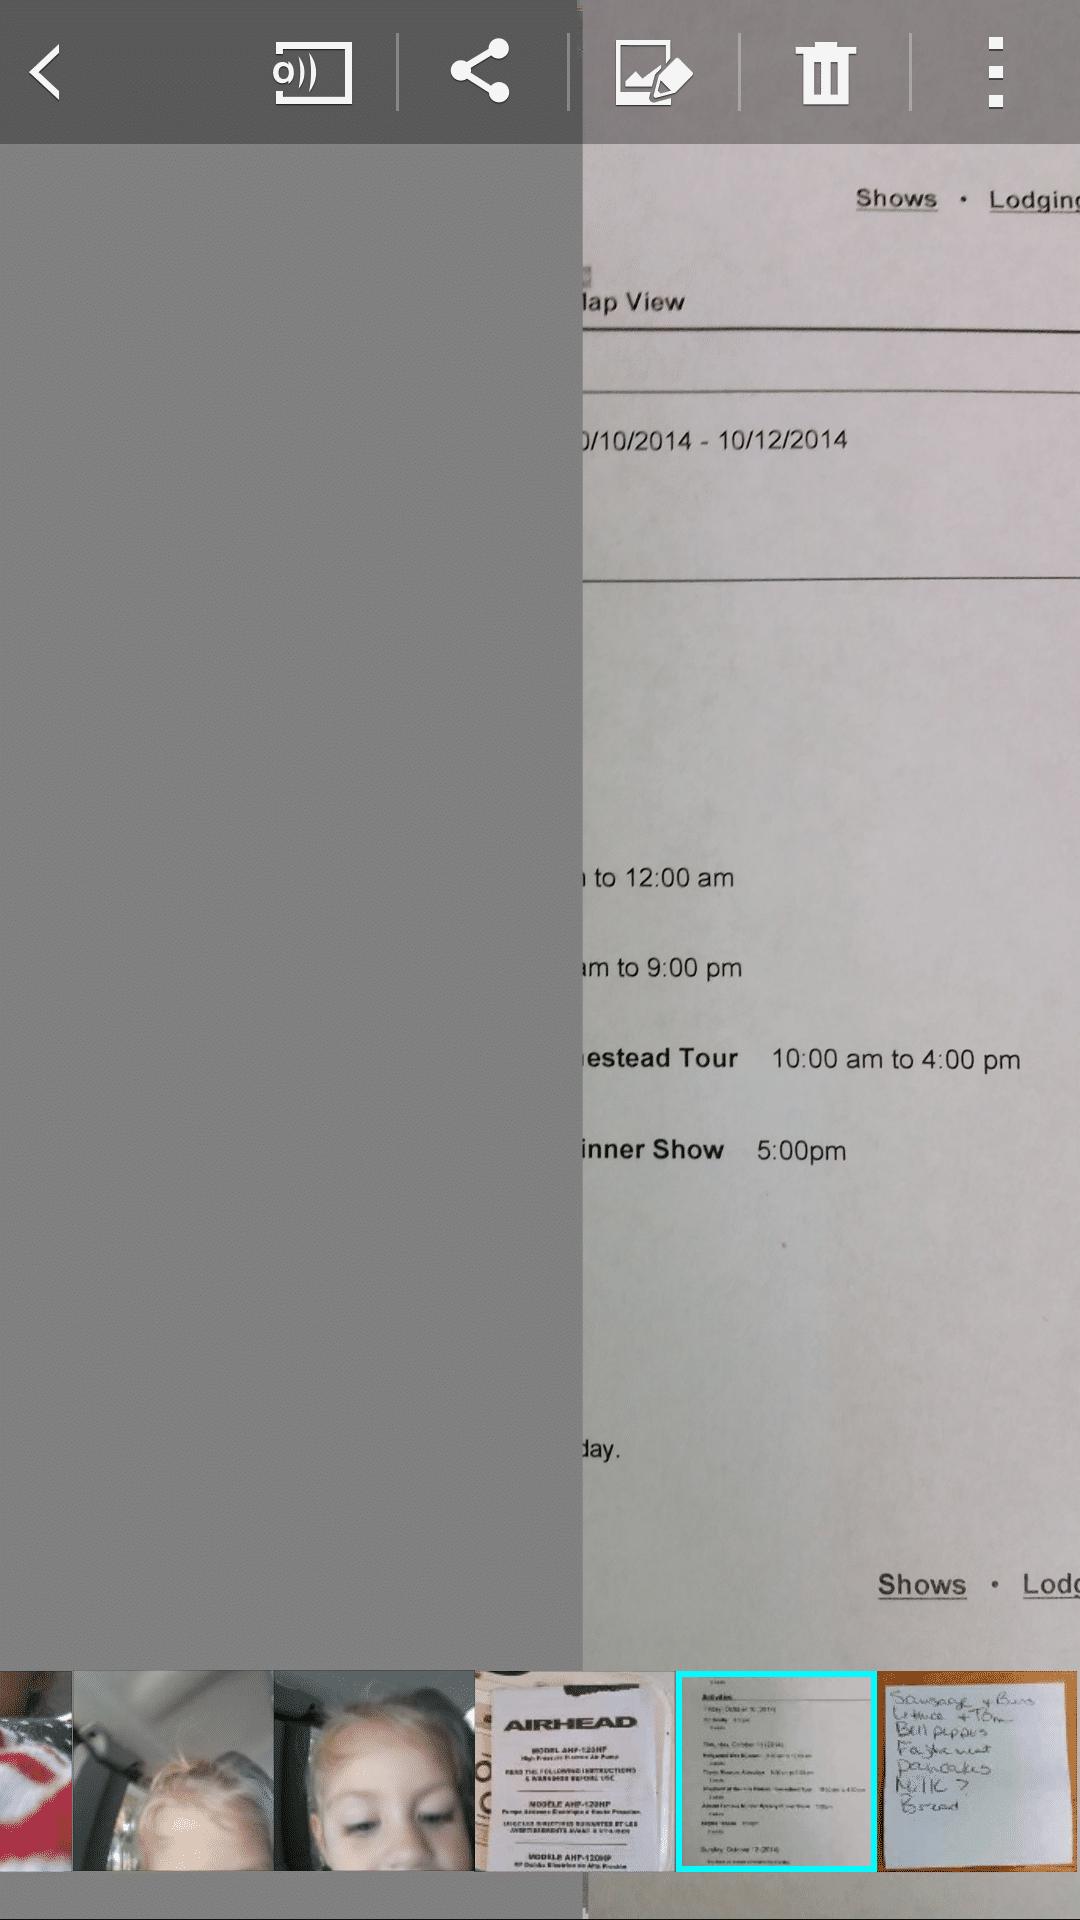 Screenshot_2014-07-22-10-13-25.png